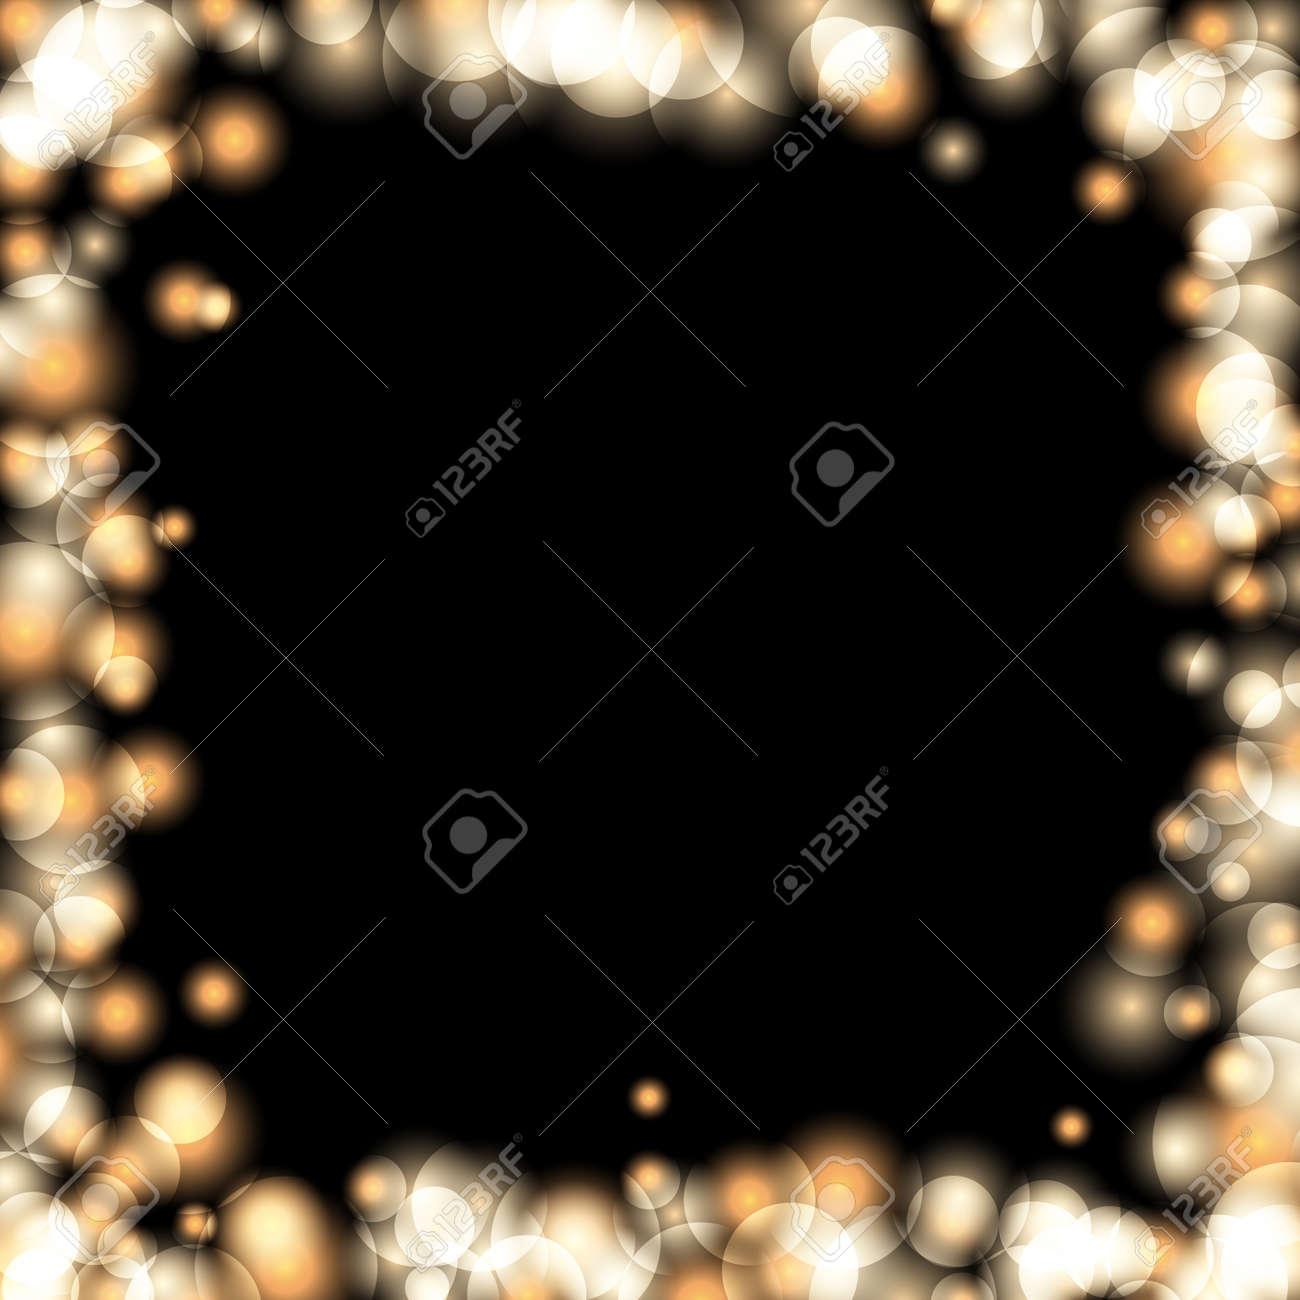 gold sparkle frame abstract black background light golden border glitter merry christmas card